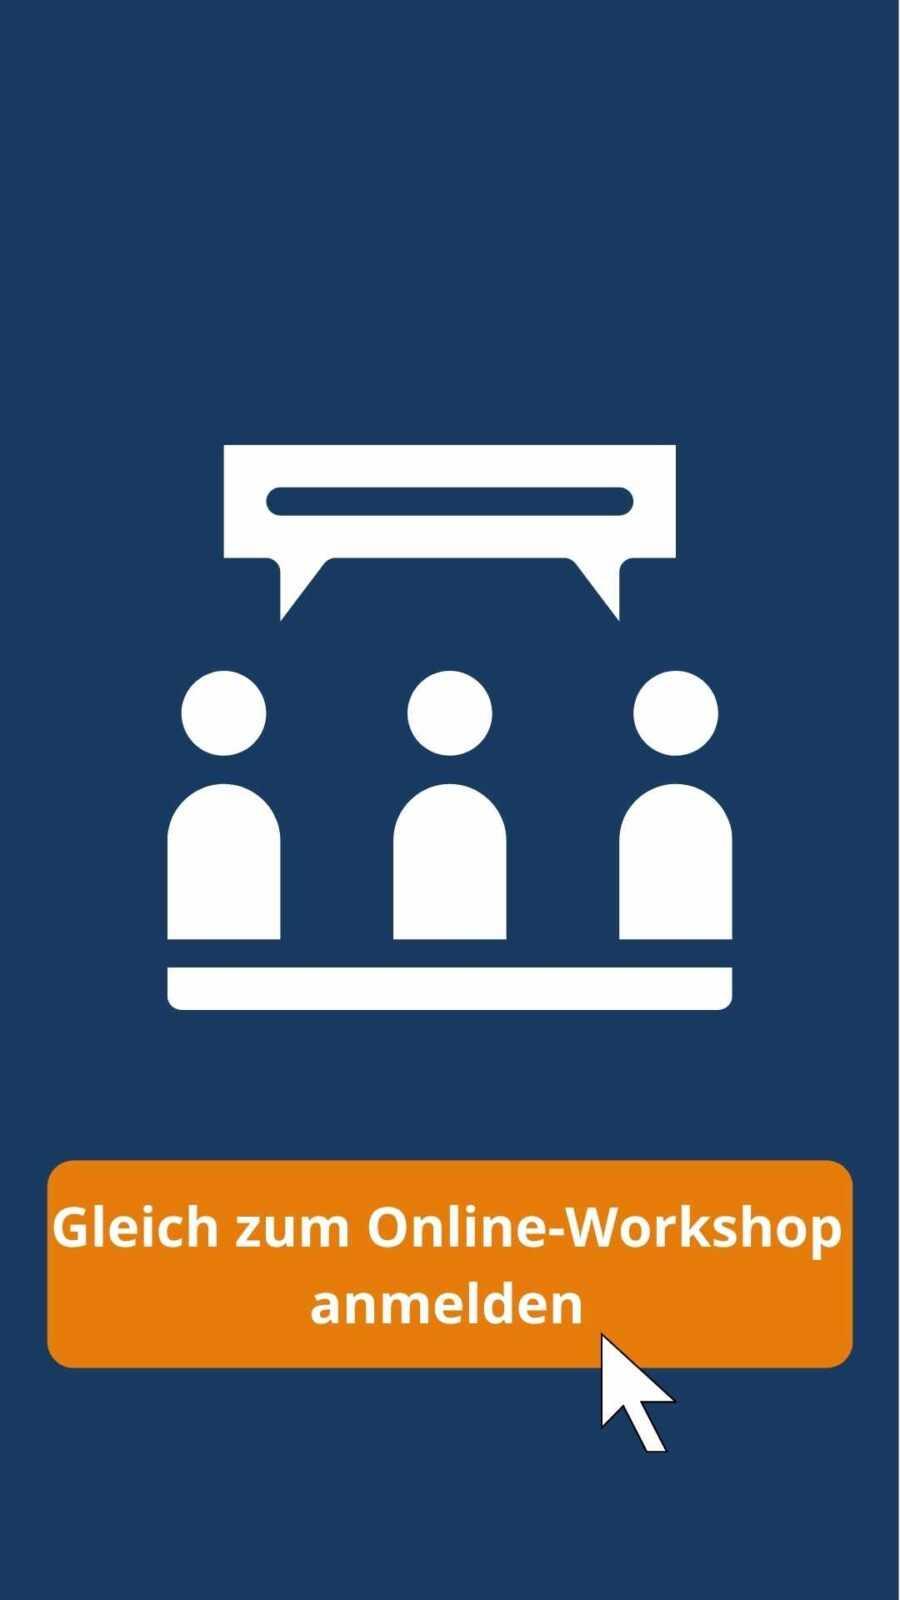 Online-Workshop anmelden Online-Beratung